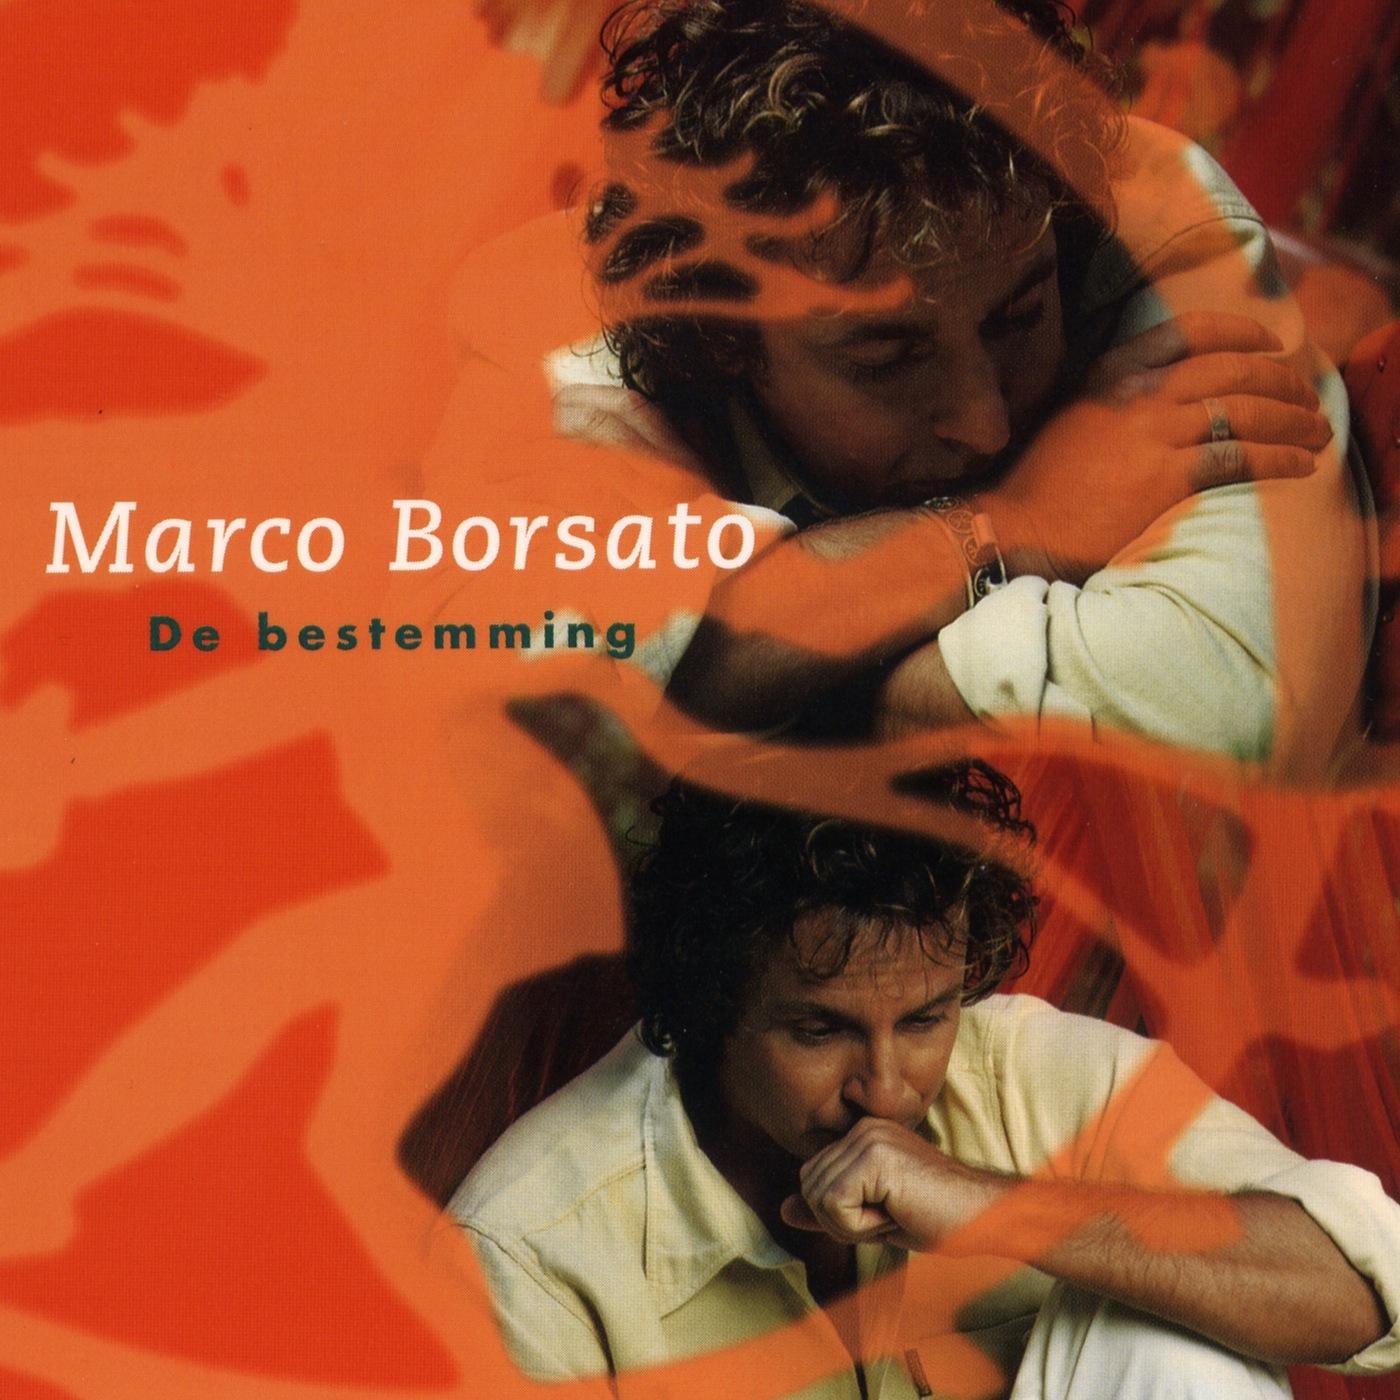 Marco Borsato - De bestemming - single